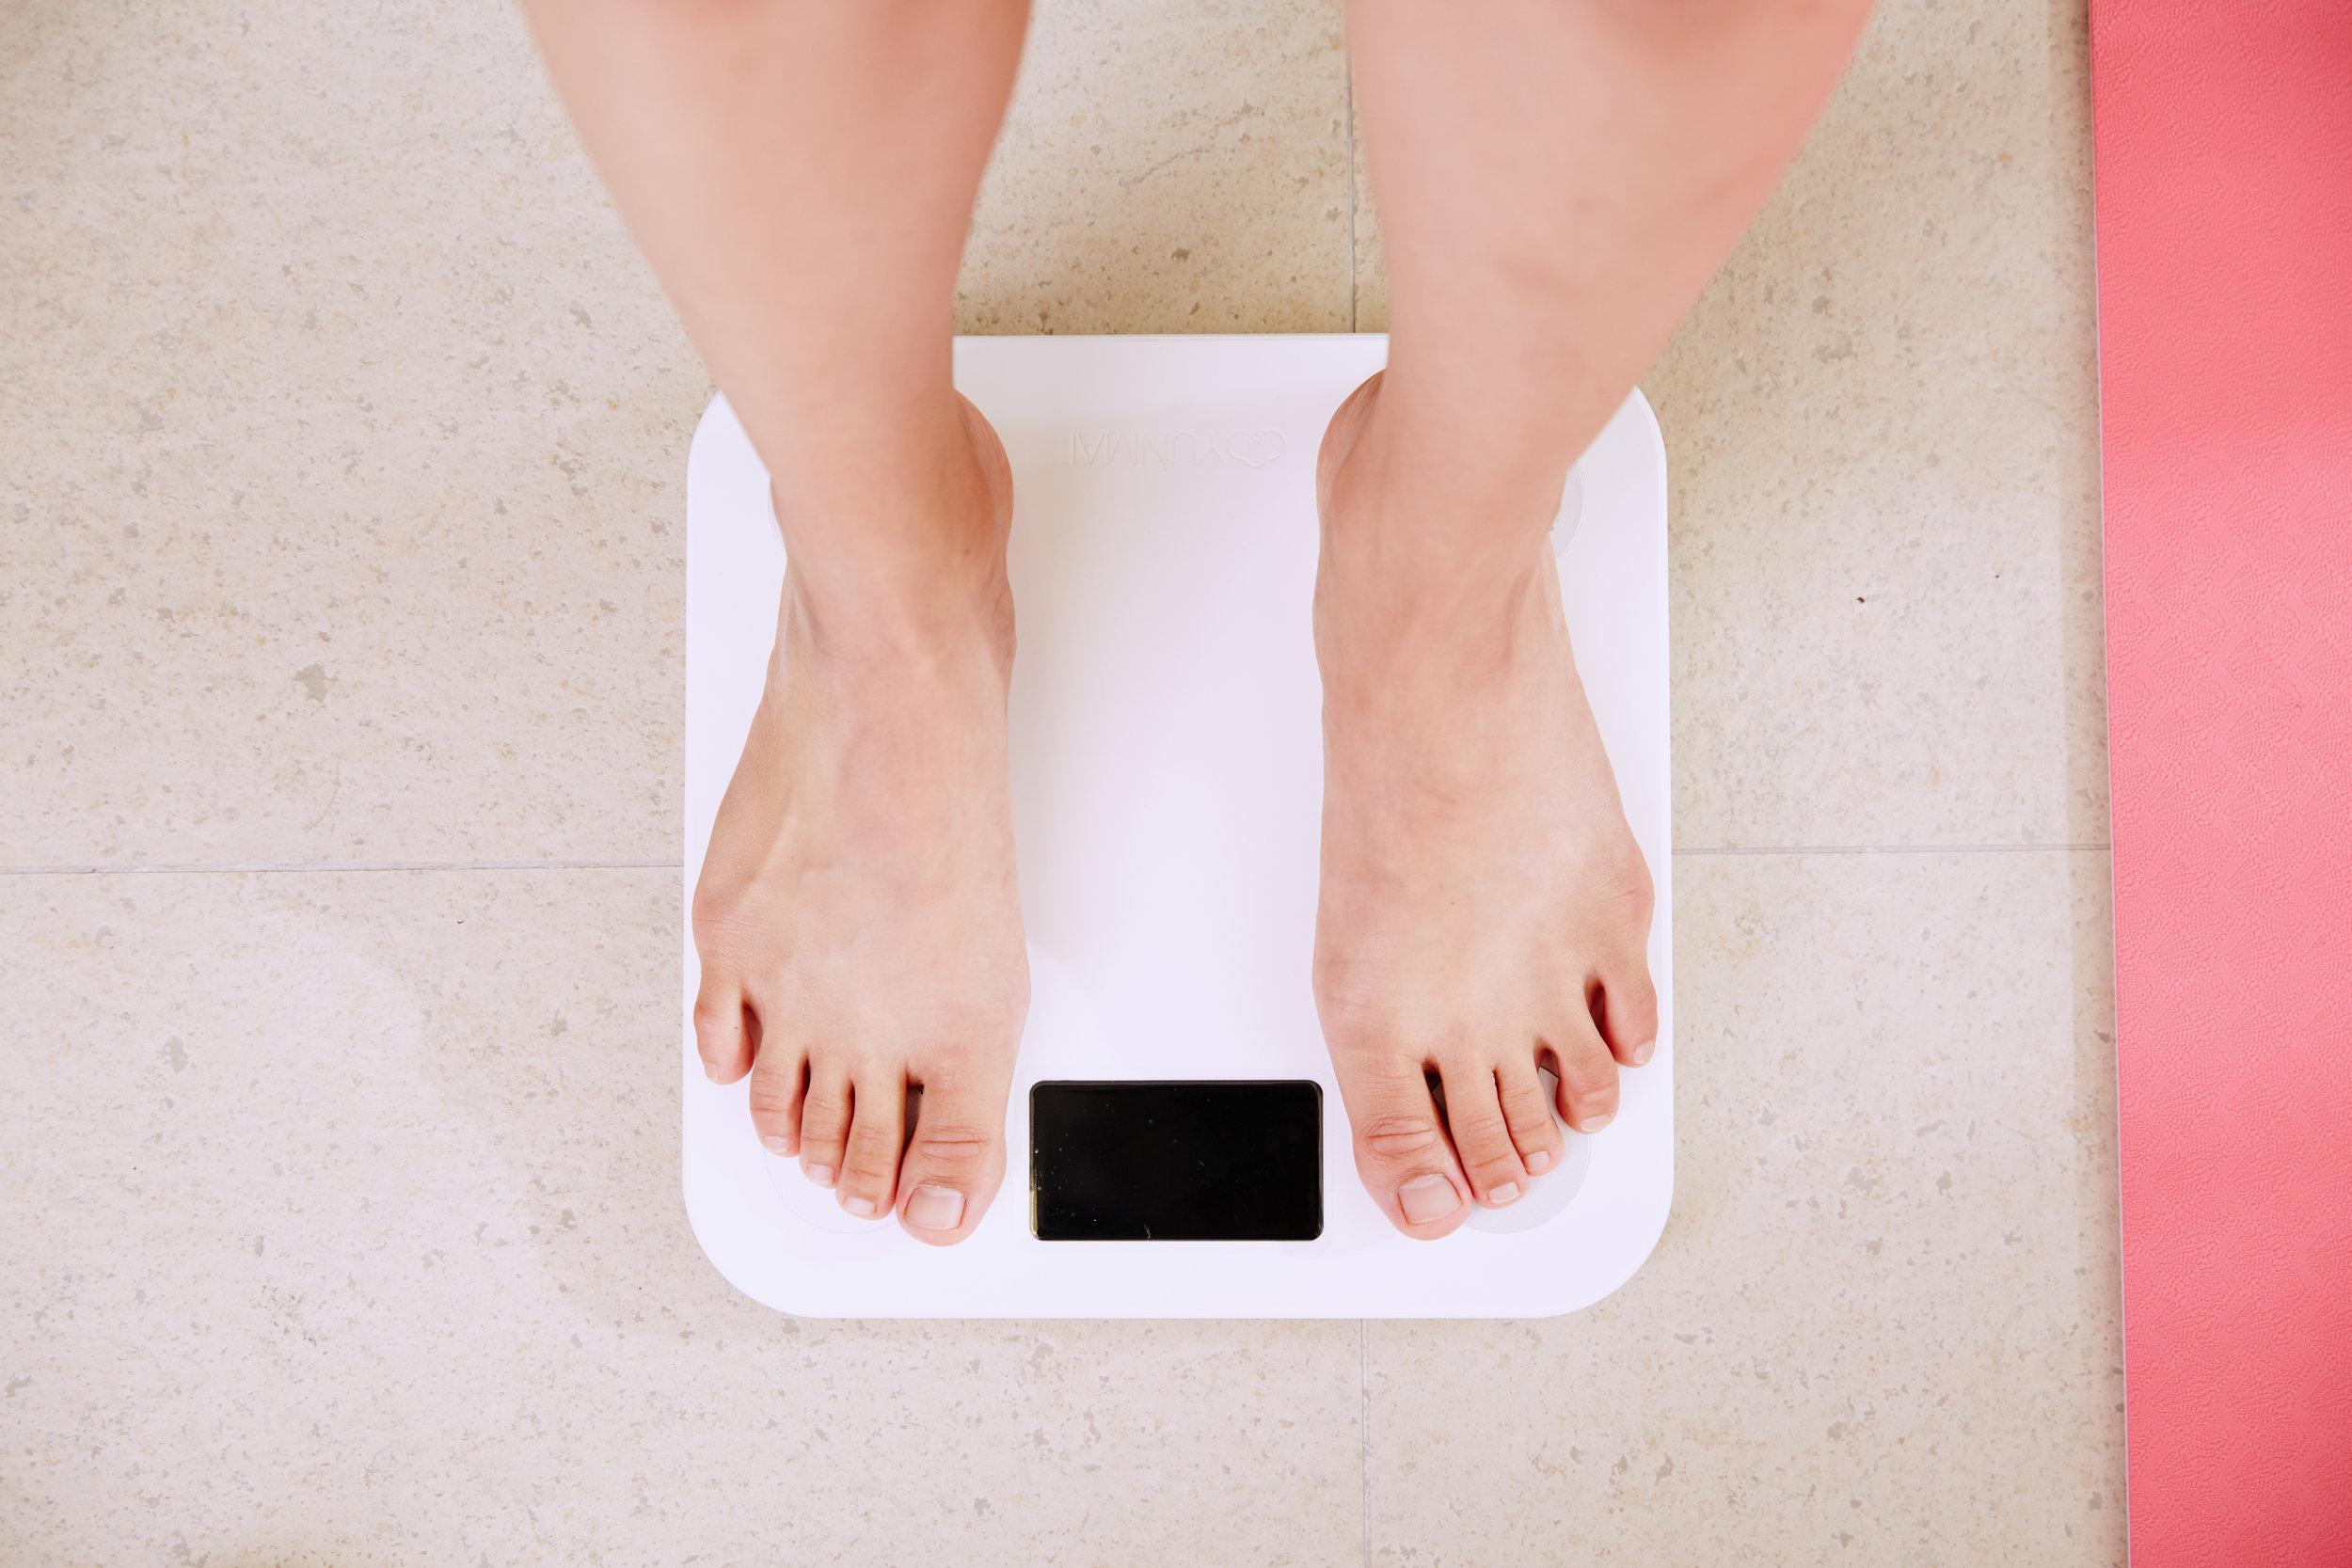 EXCESS WEIGHT -